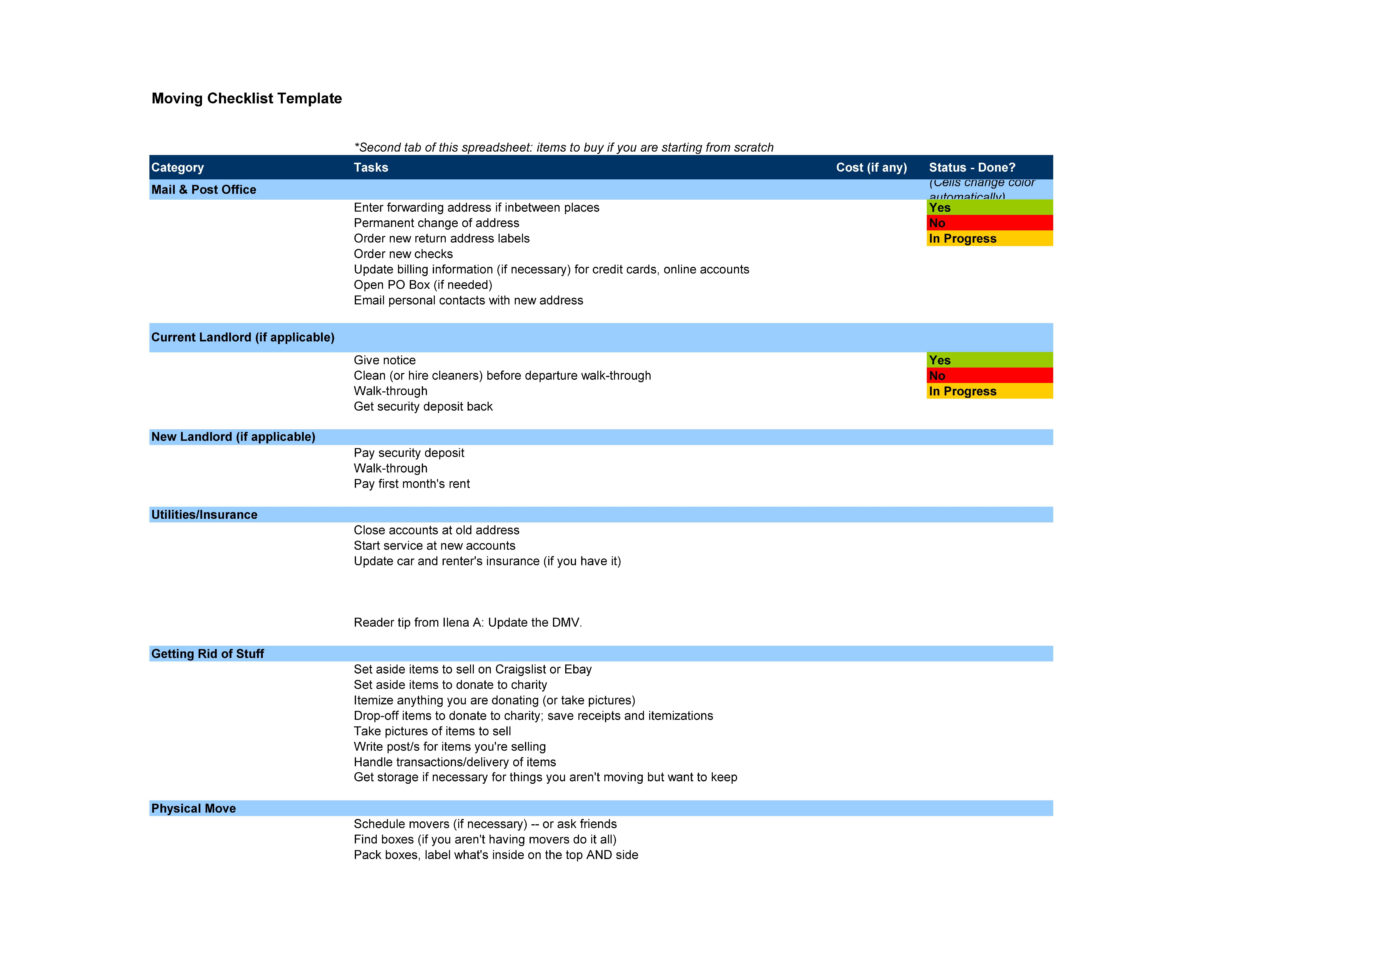 Moving Checklist Spreadsheet Inside 45 Great Moving Checklists [Checklist For Moving In / Out